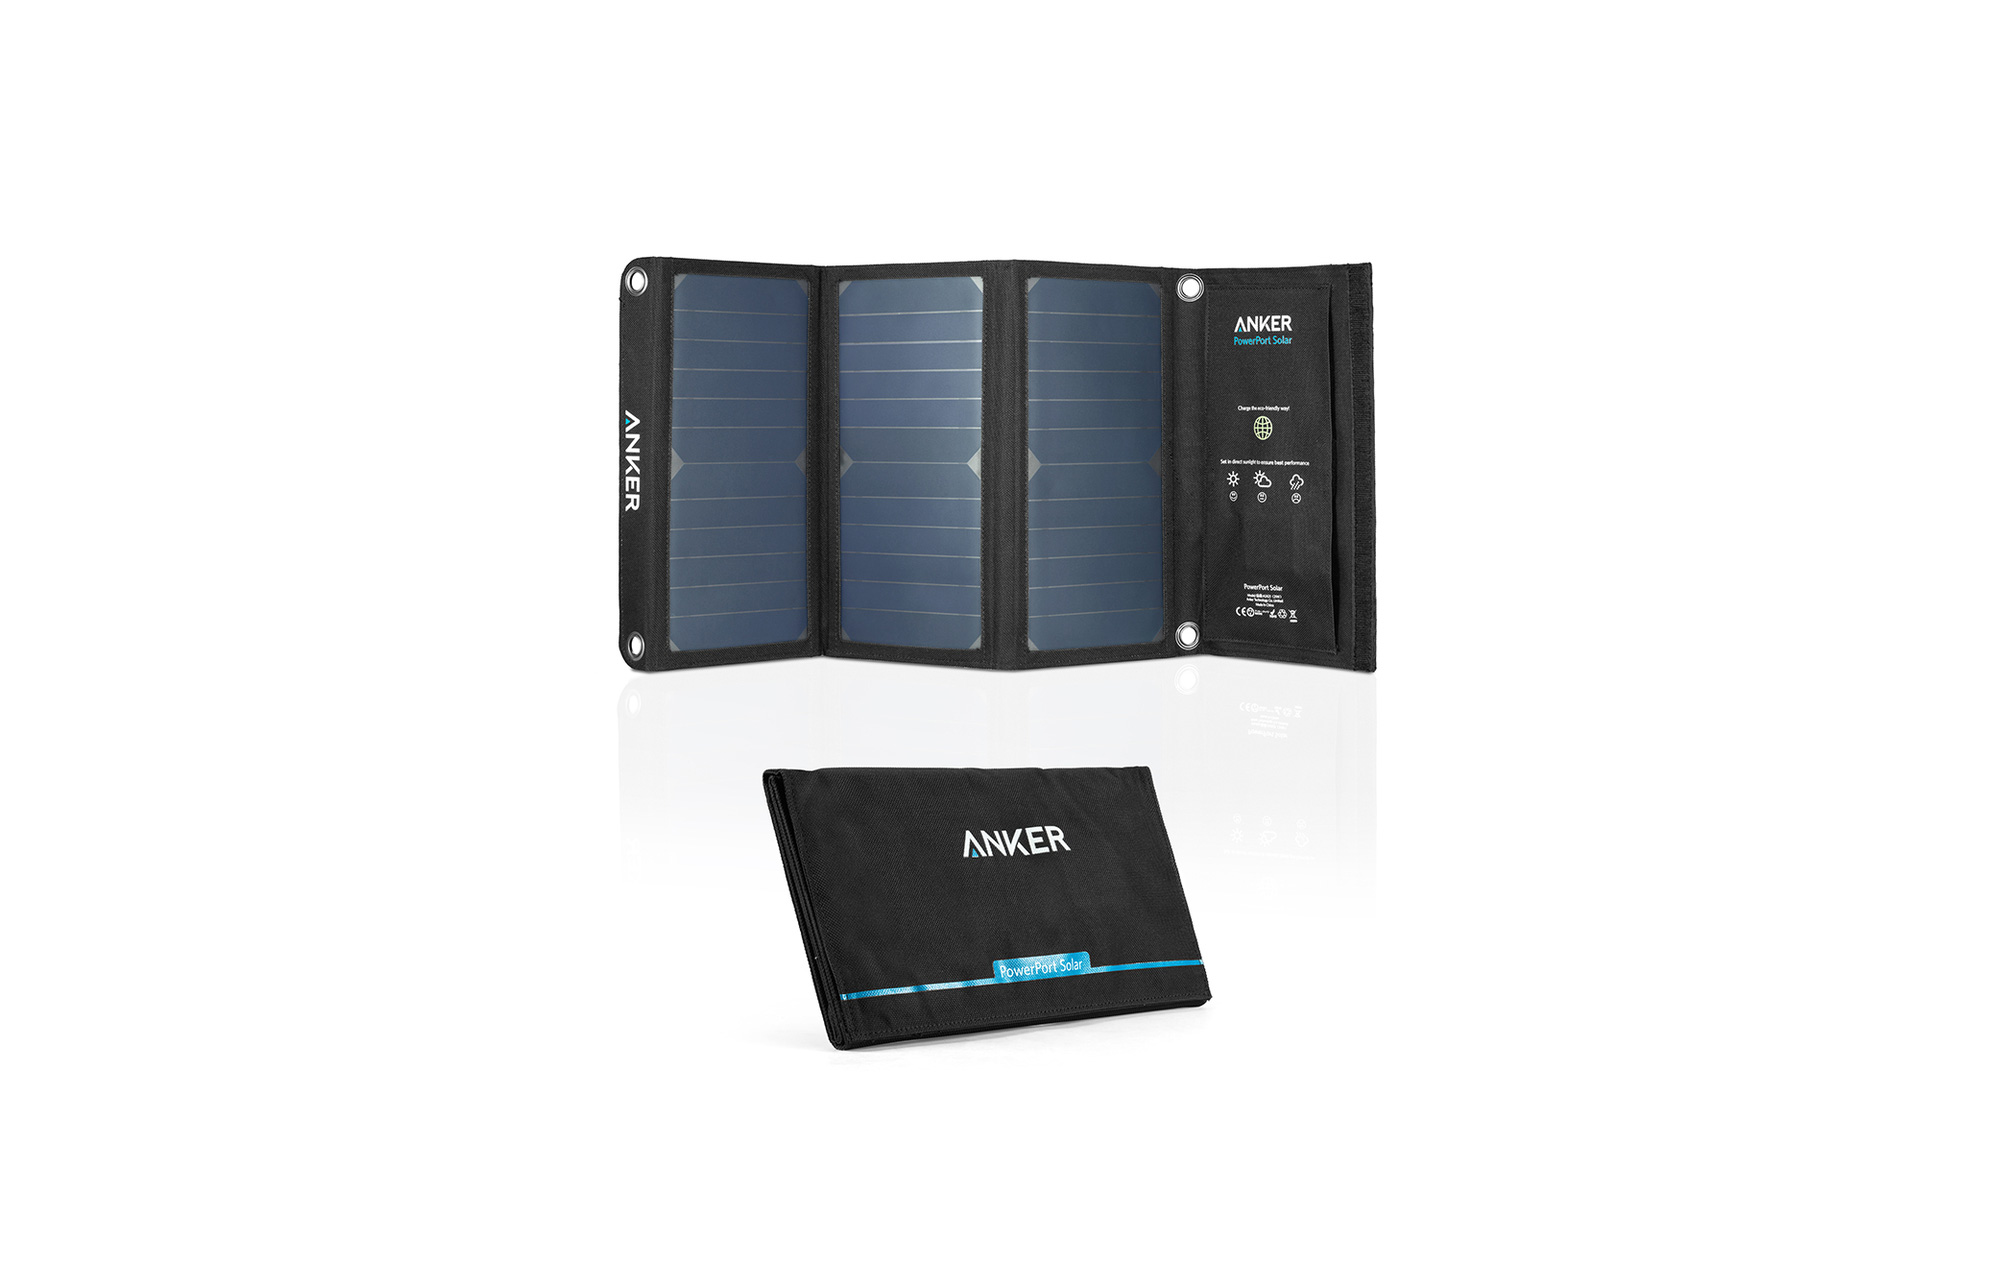 Anker Powerport Solar Charger 3 Panel 21 Watt Dual Usb